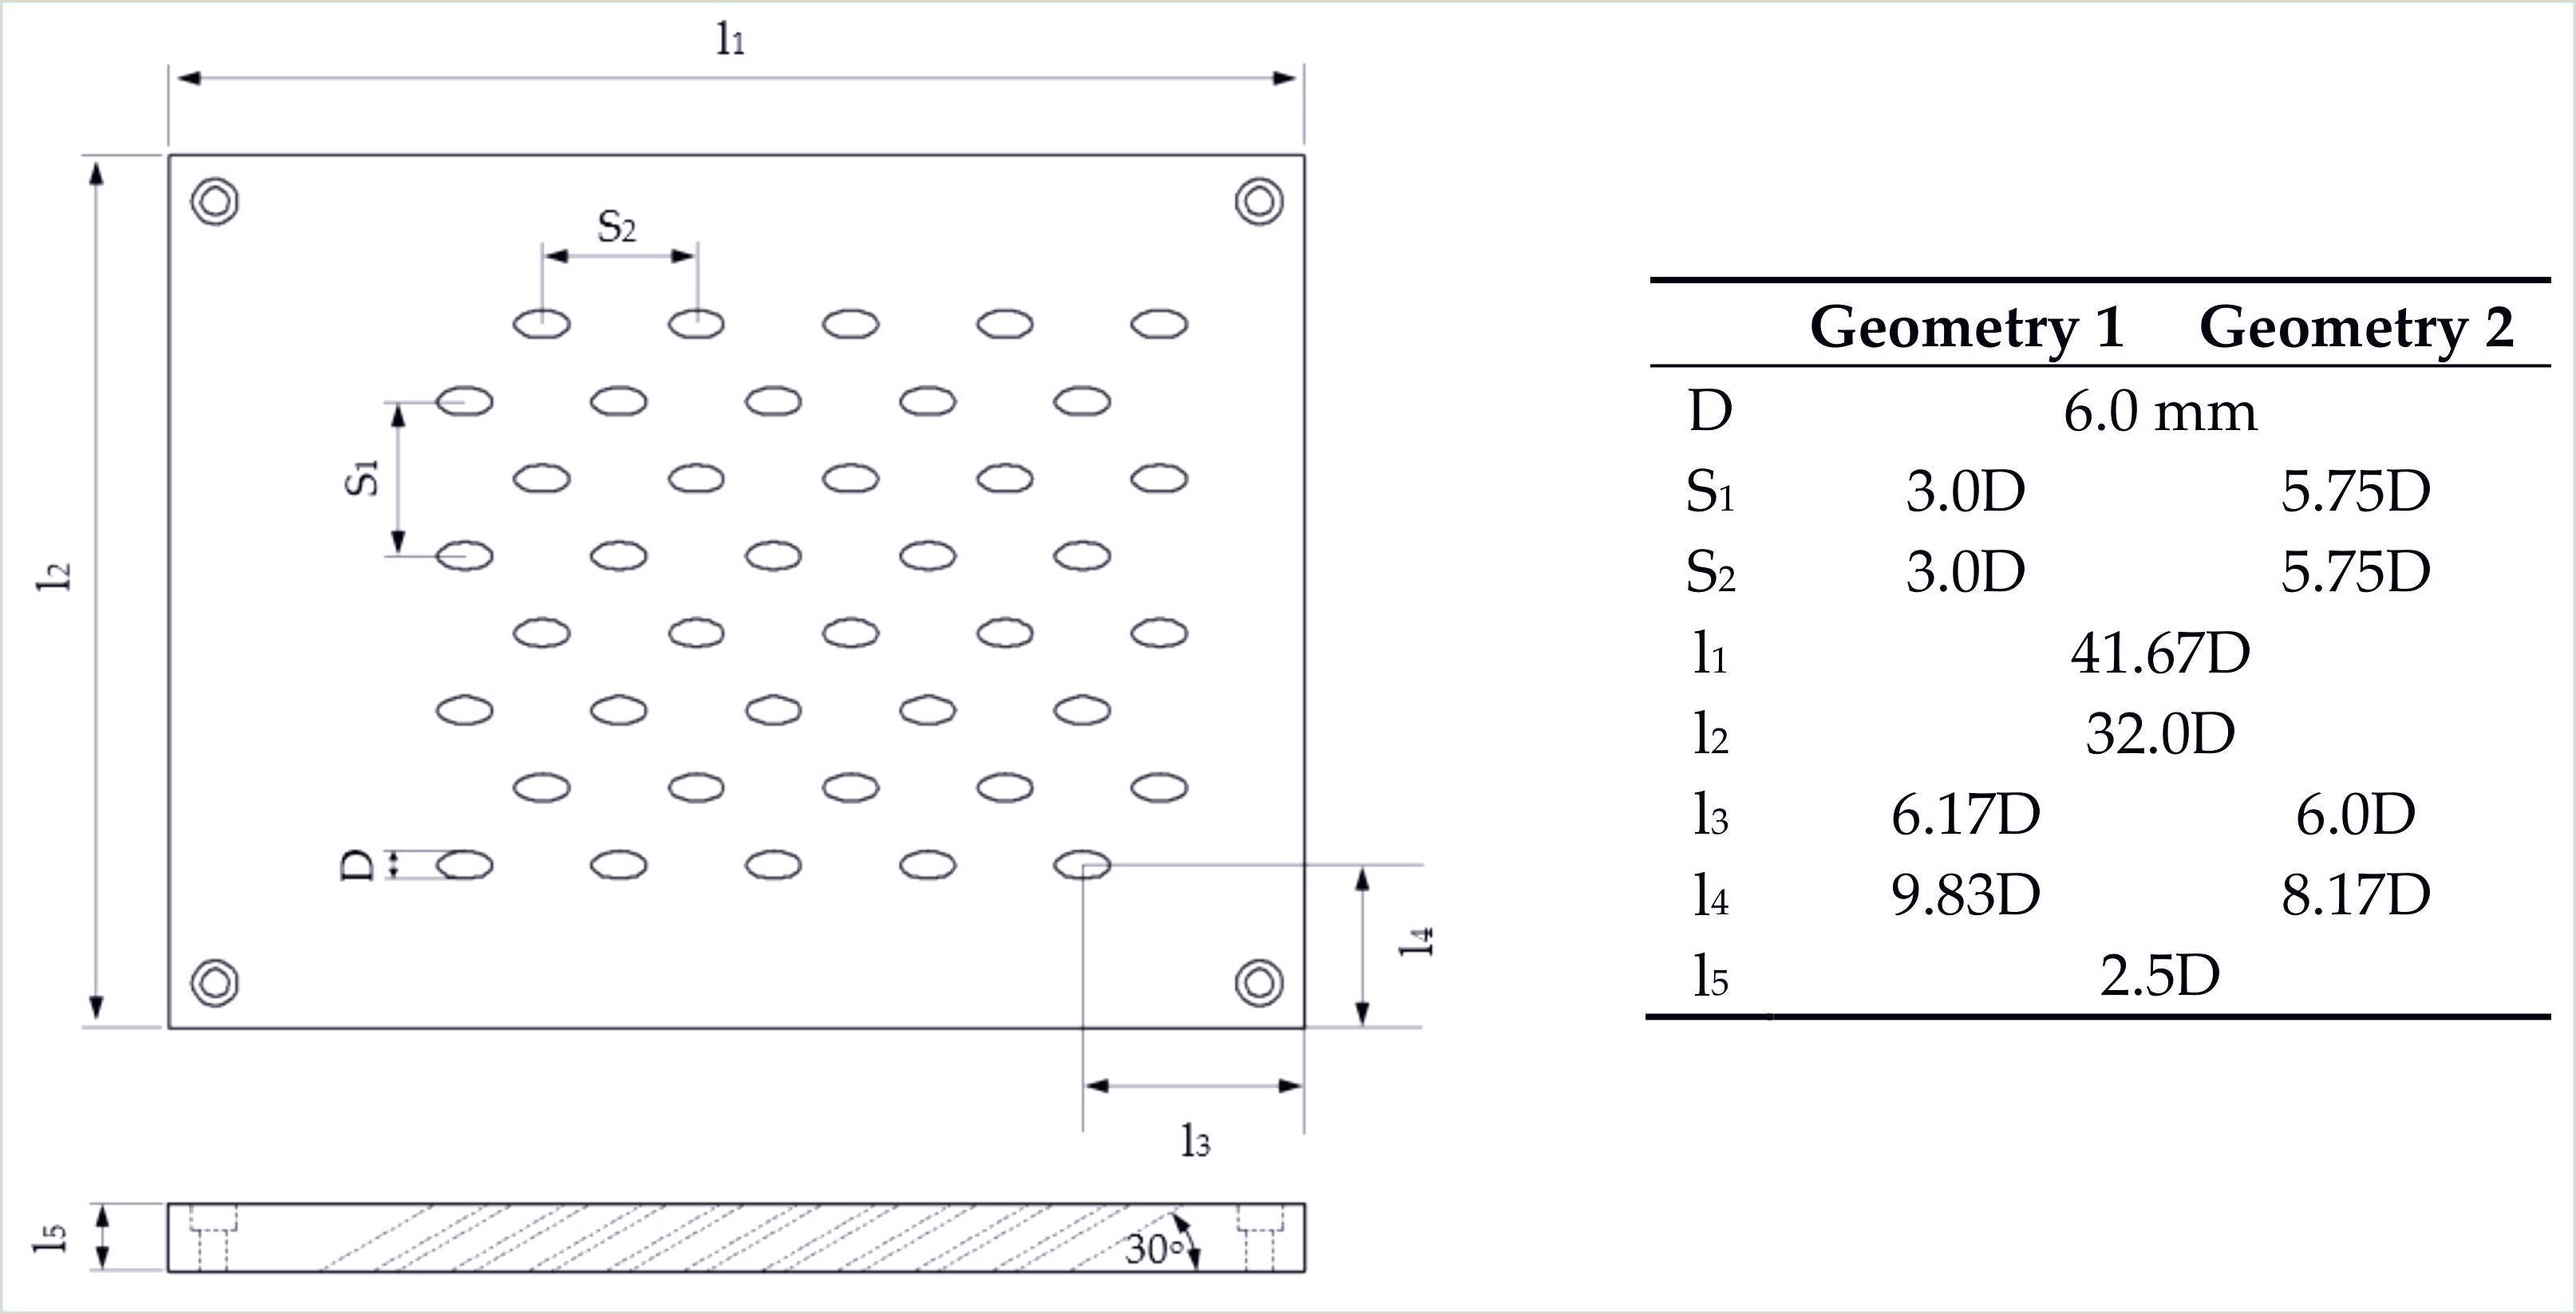 Professional Cv Template Doc Exemple De Cv Bac Pro Merce Douce Modele Cv De Luxe Cv